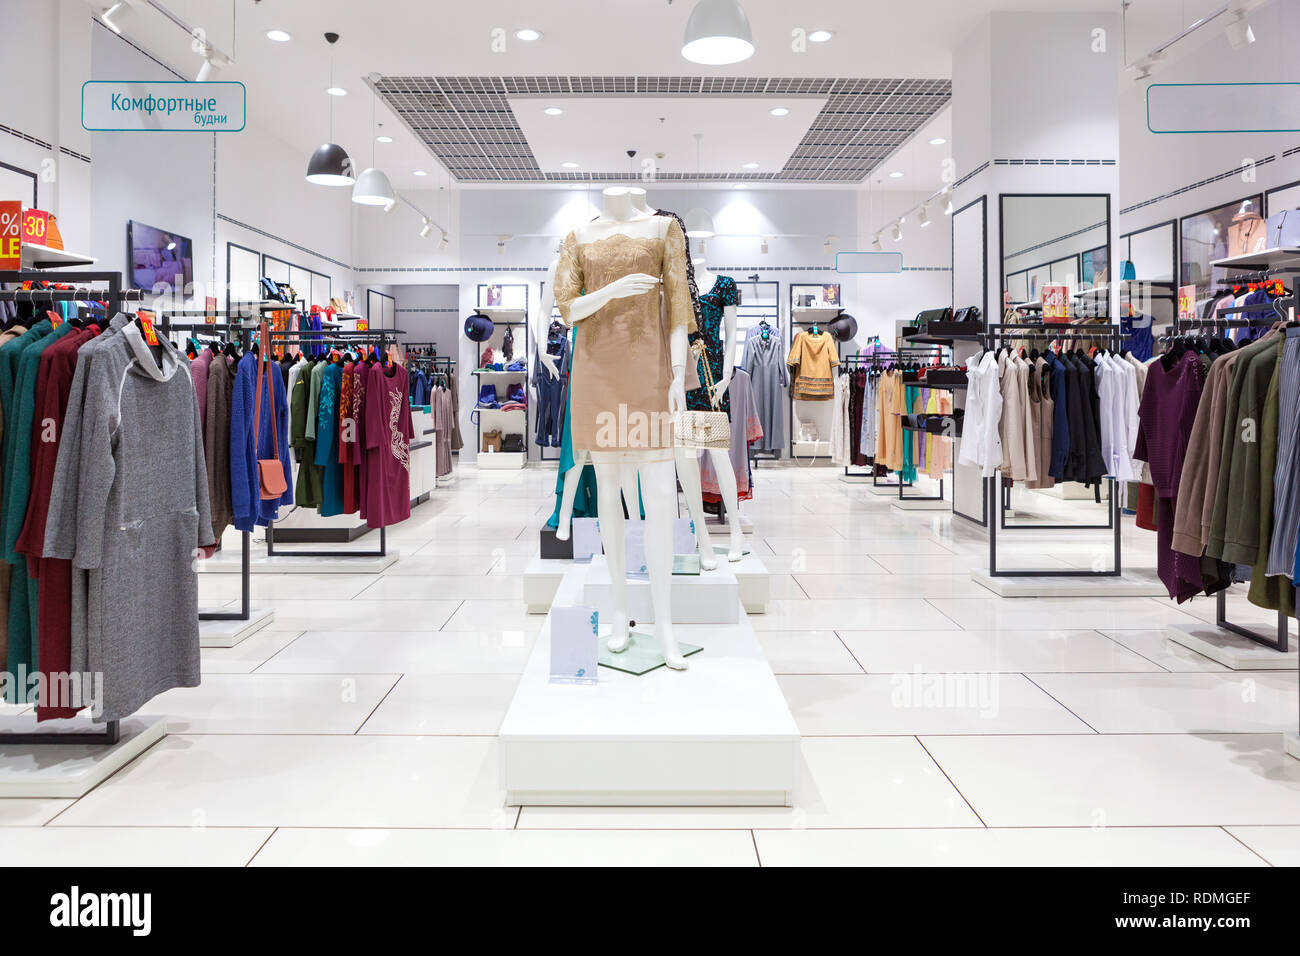 e4c77f419415 Interior of fashion clothing store for women Stock Photo: 232177303 ...